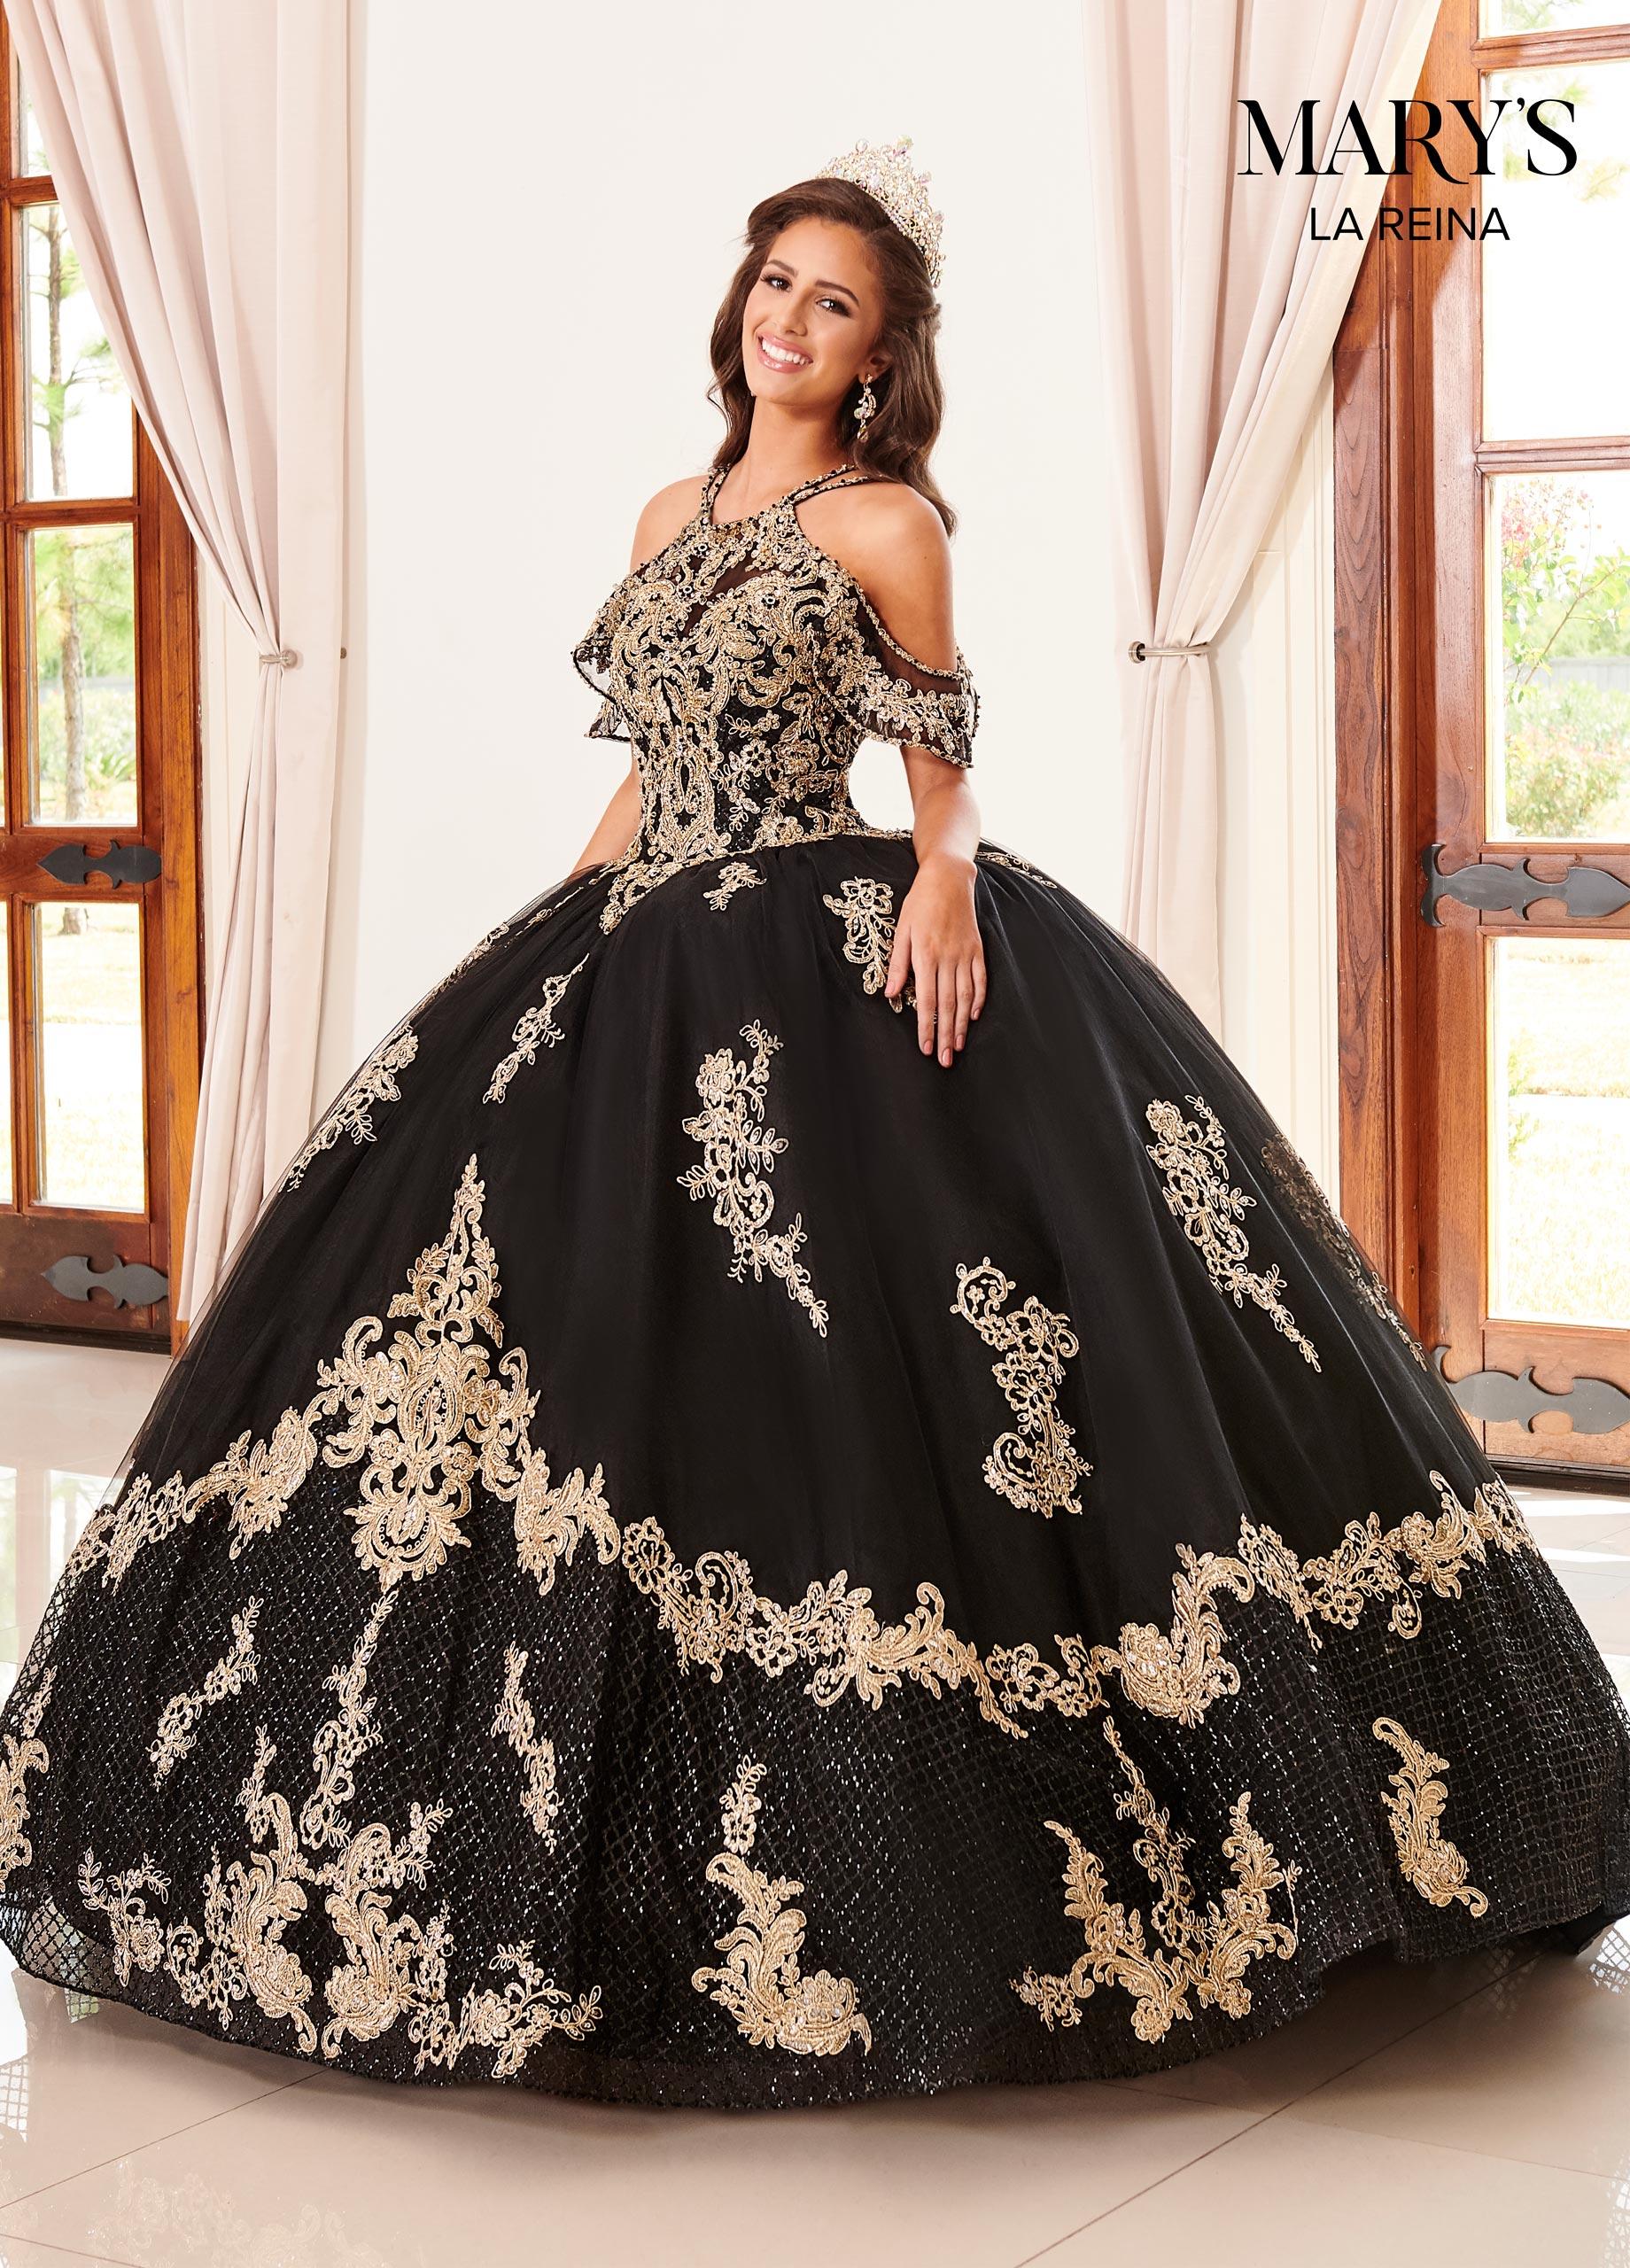 Lareina Quinceanera Dresses Style Mq2099 In Black Gold